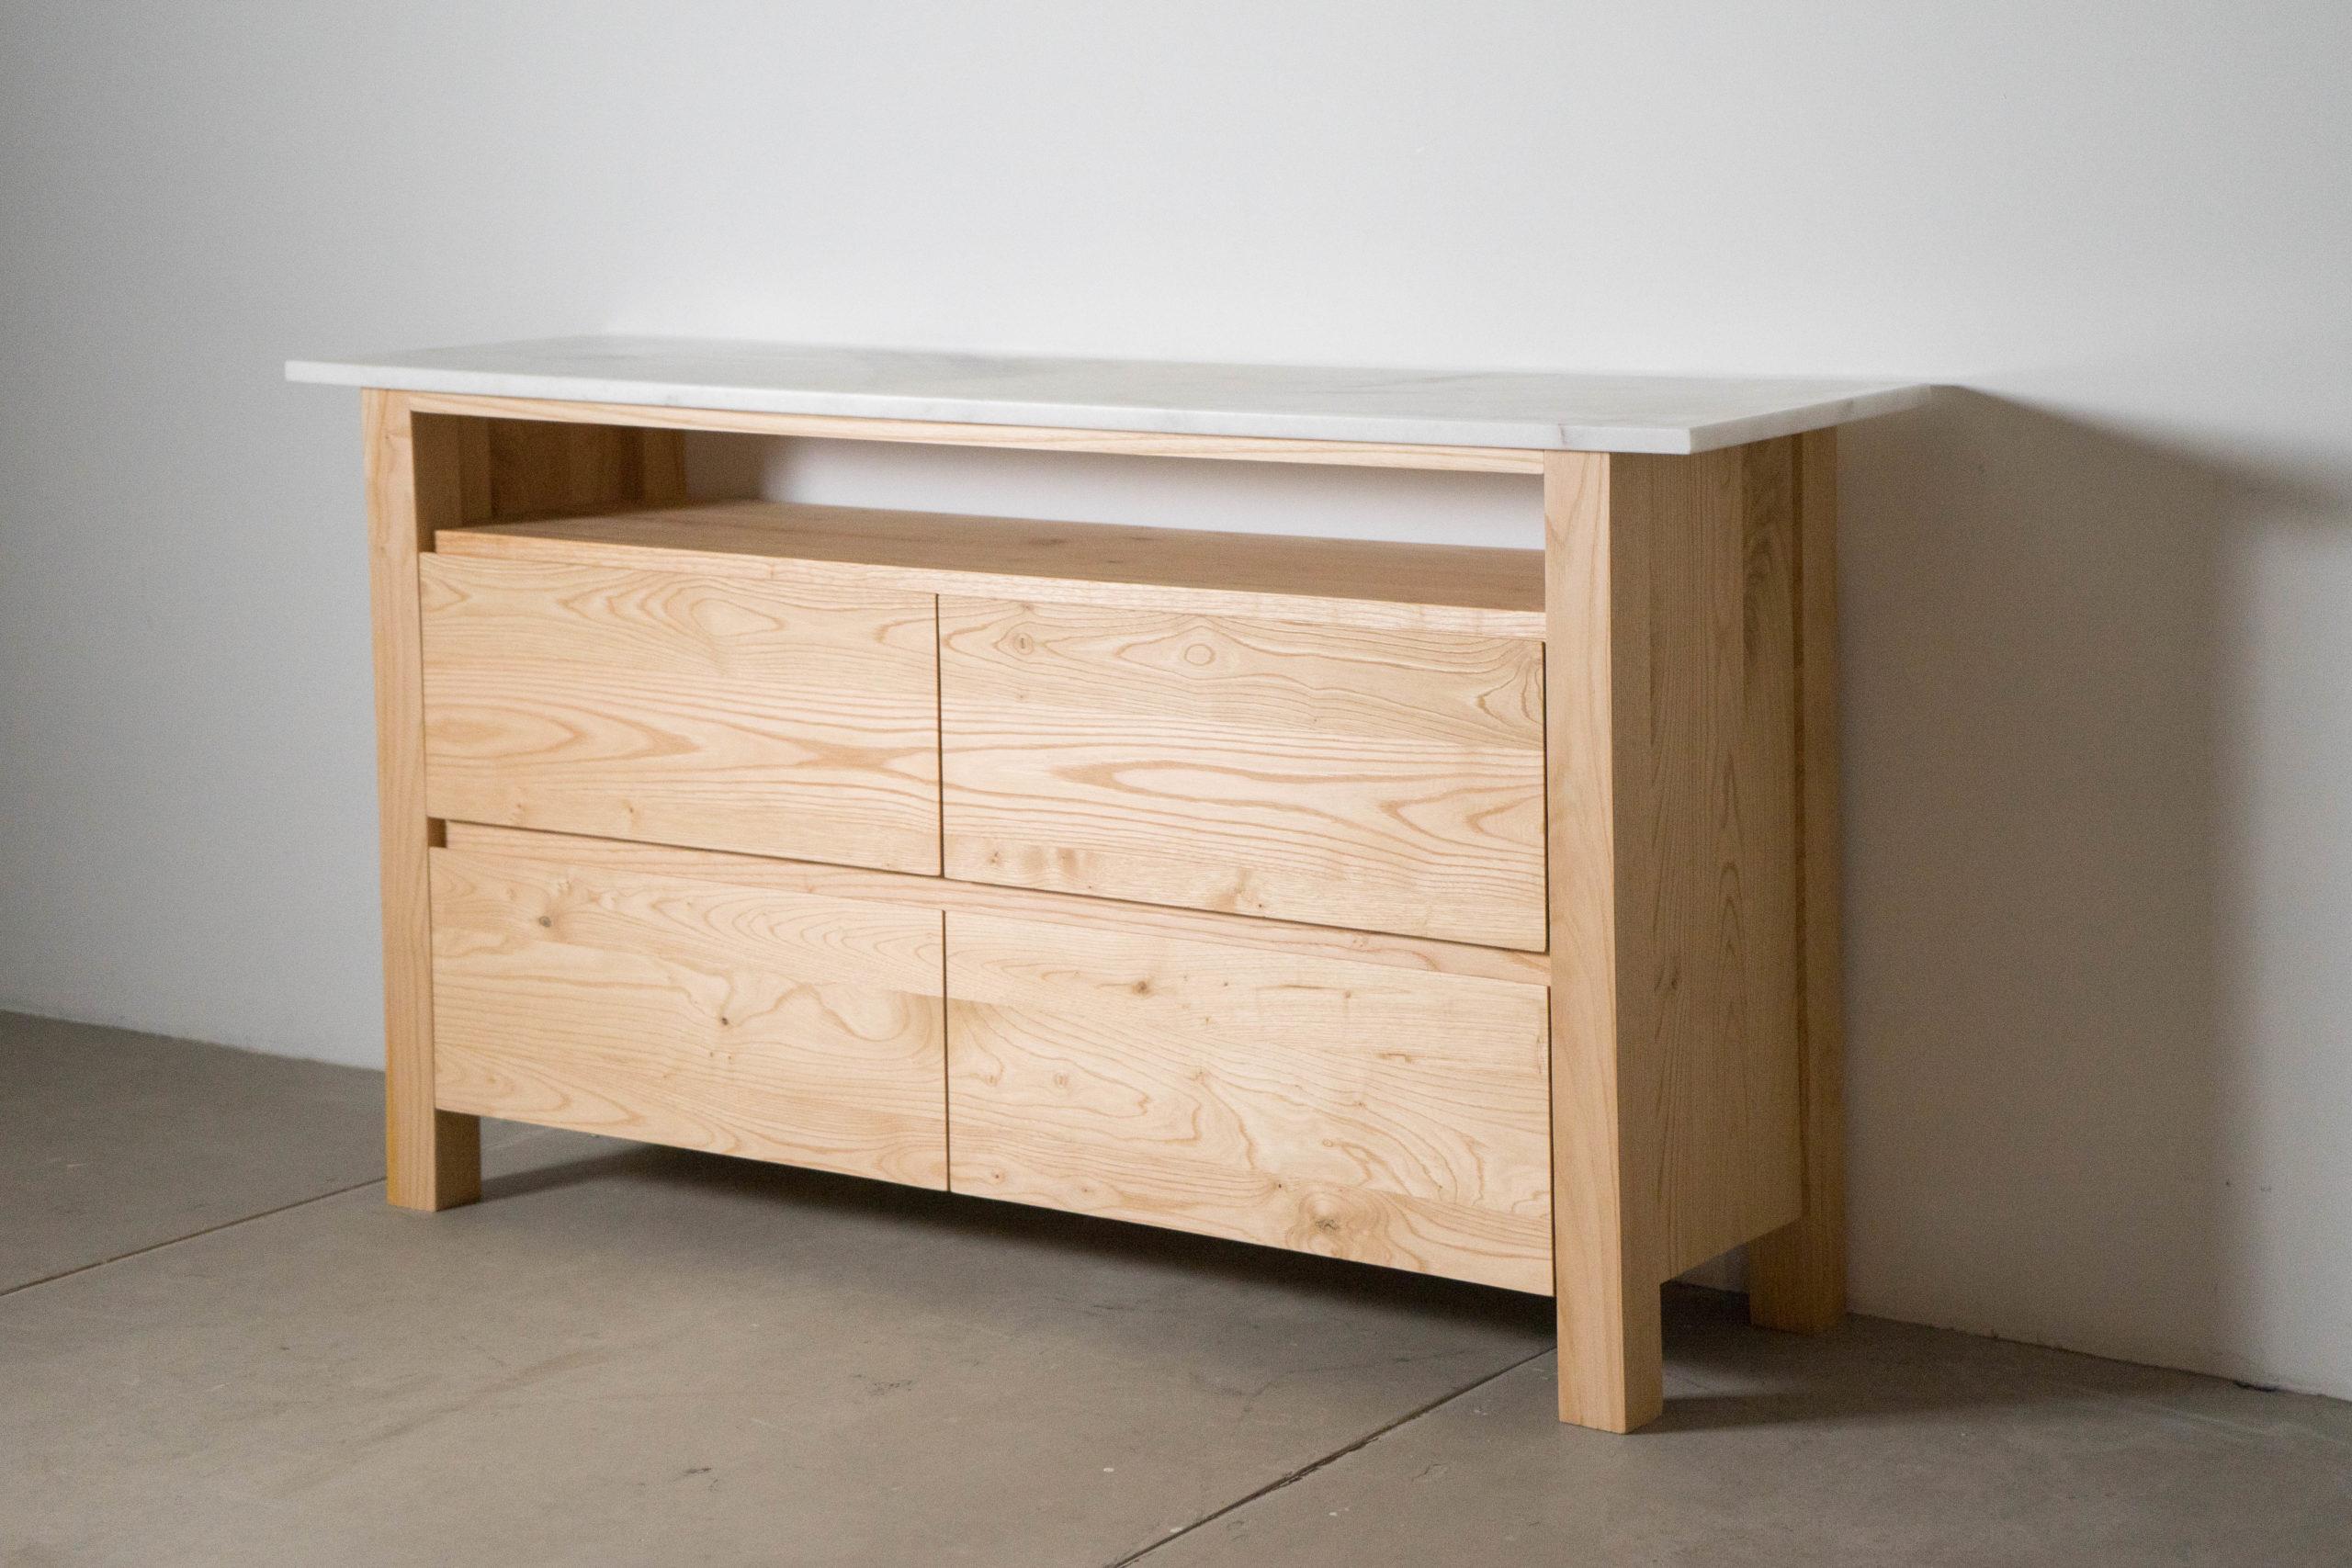 mueble de madera maciza castaño